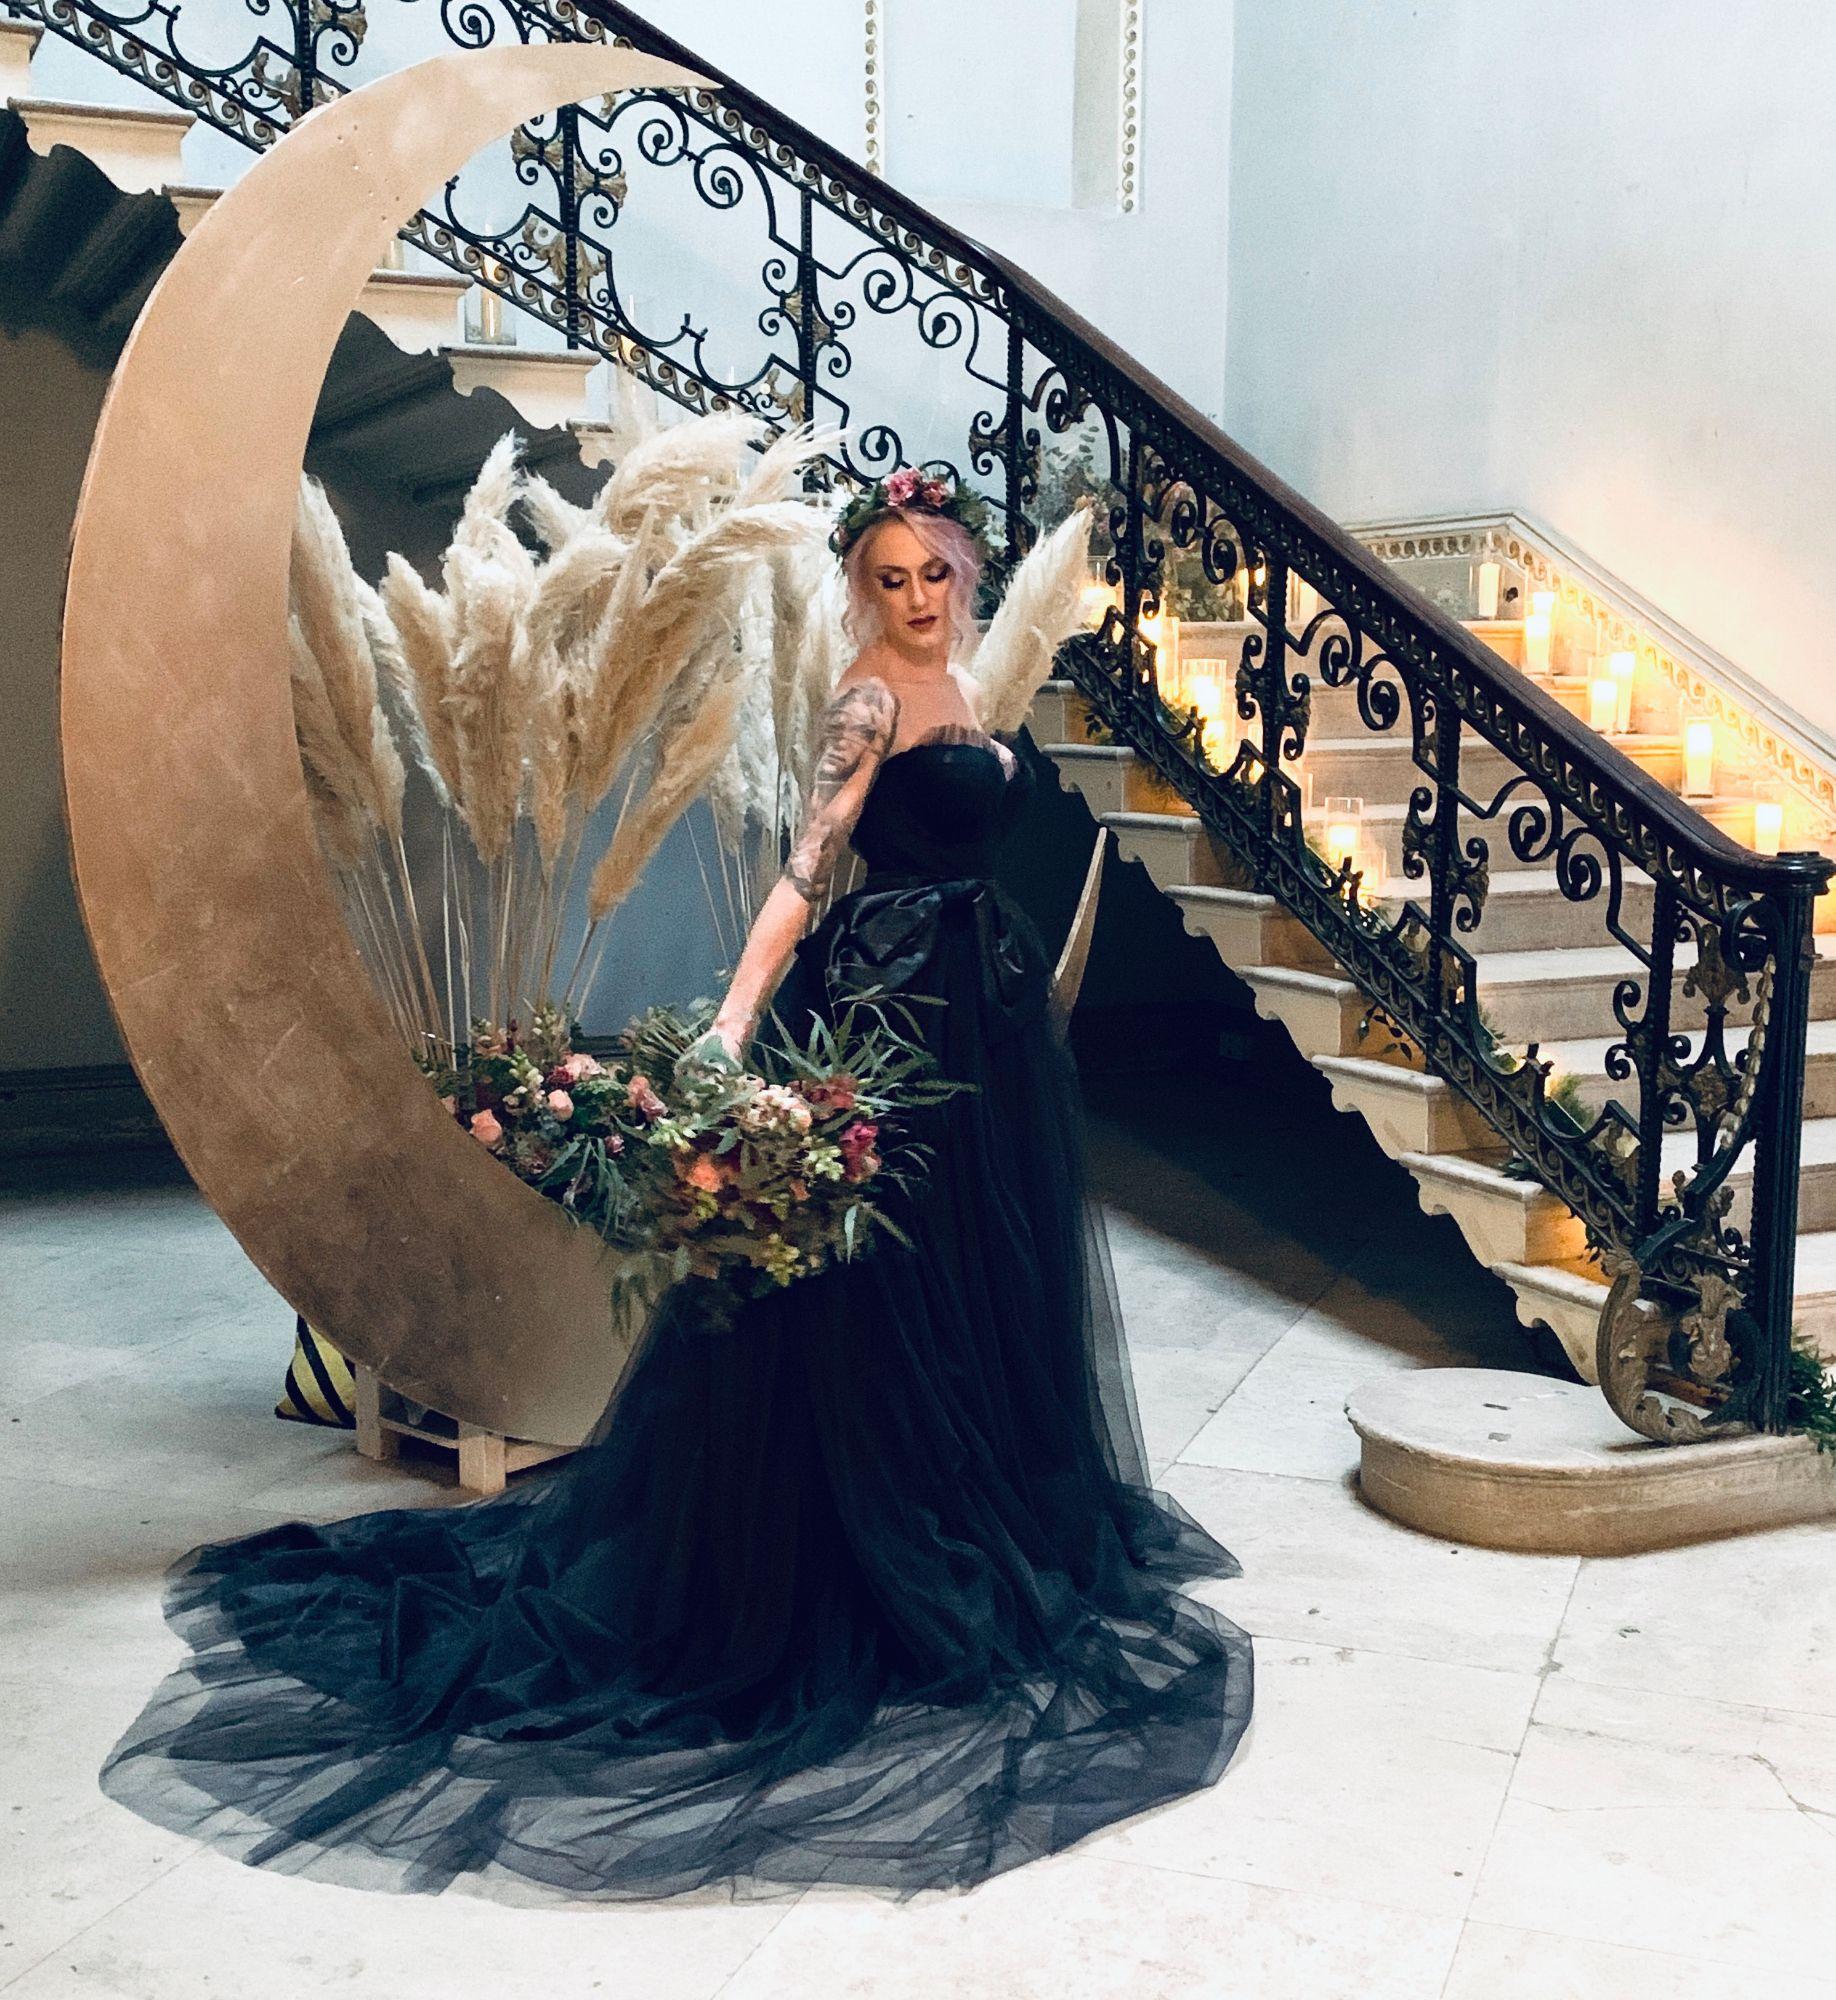 Black_corset_wedding_dress_1